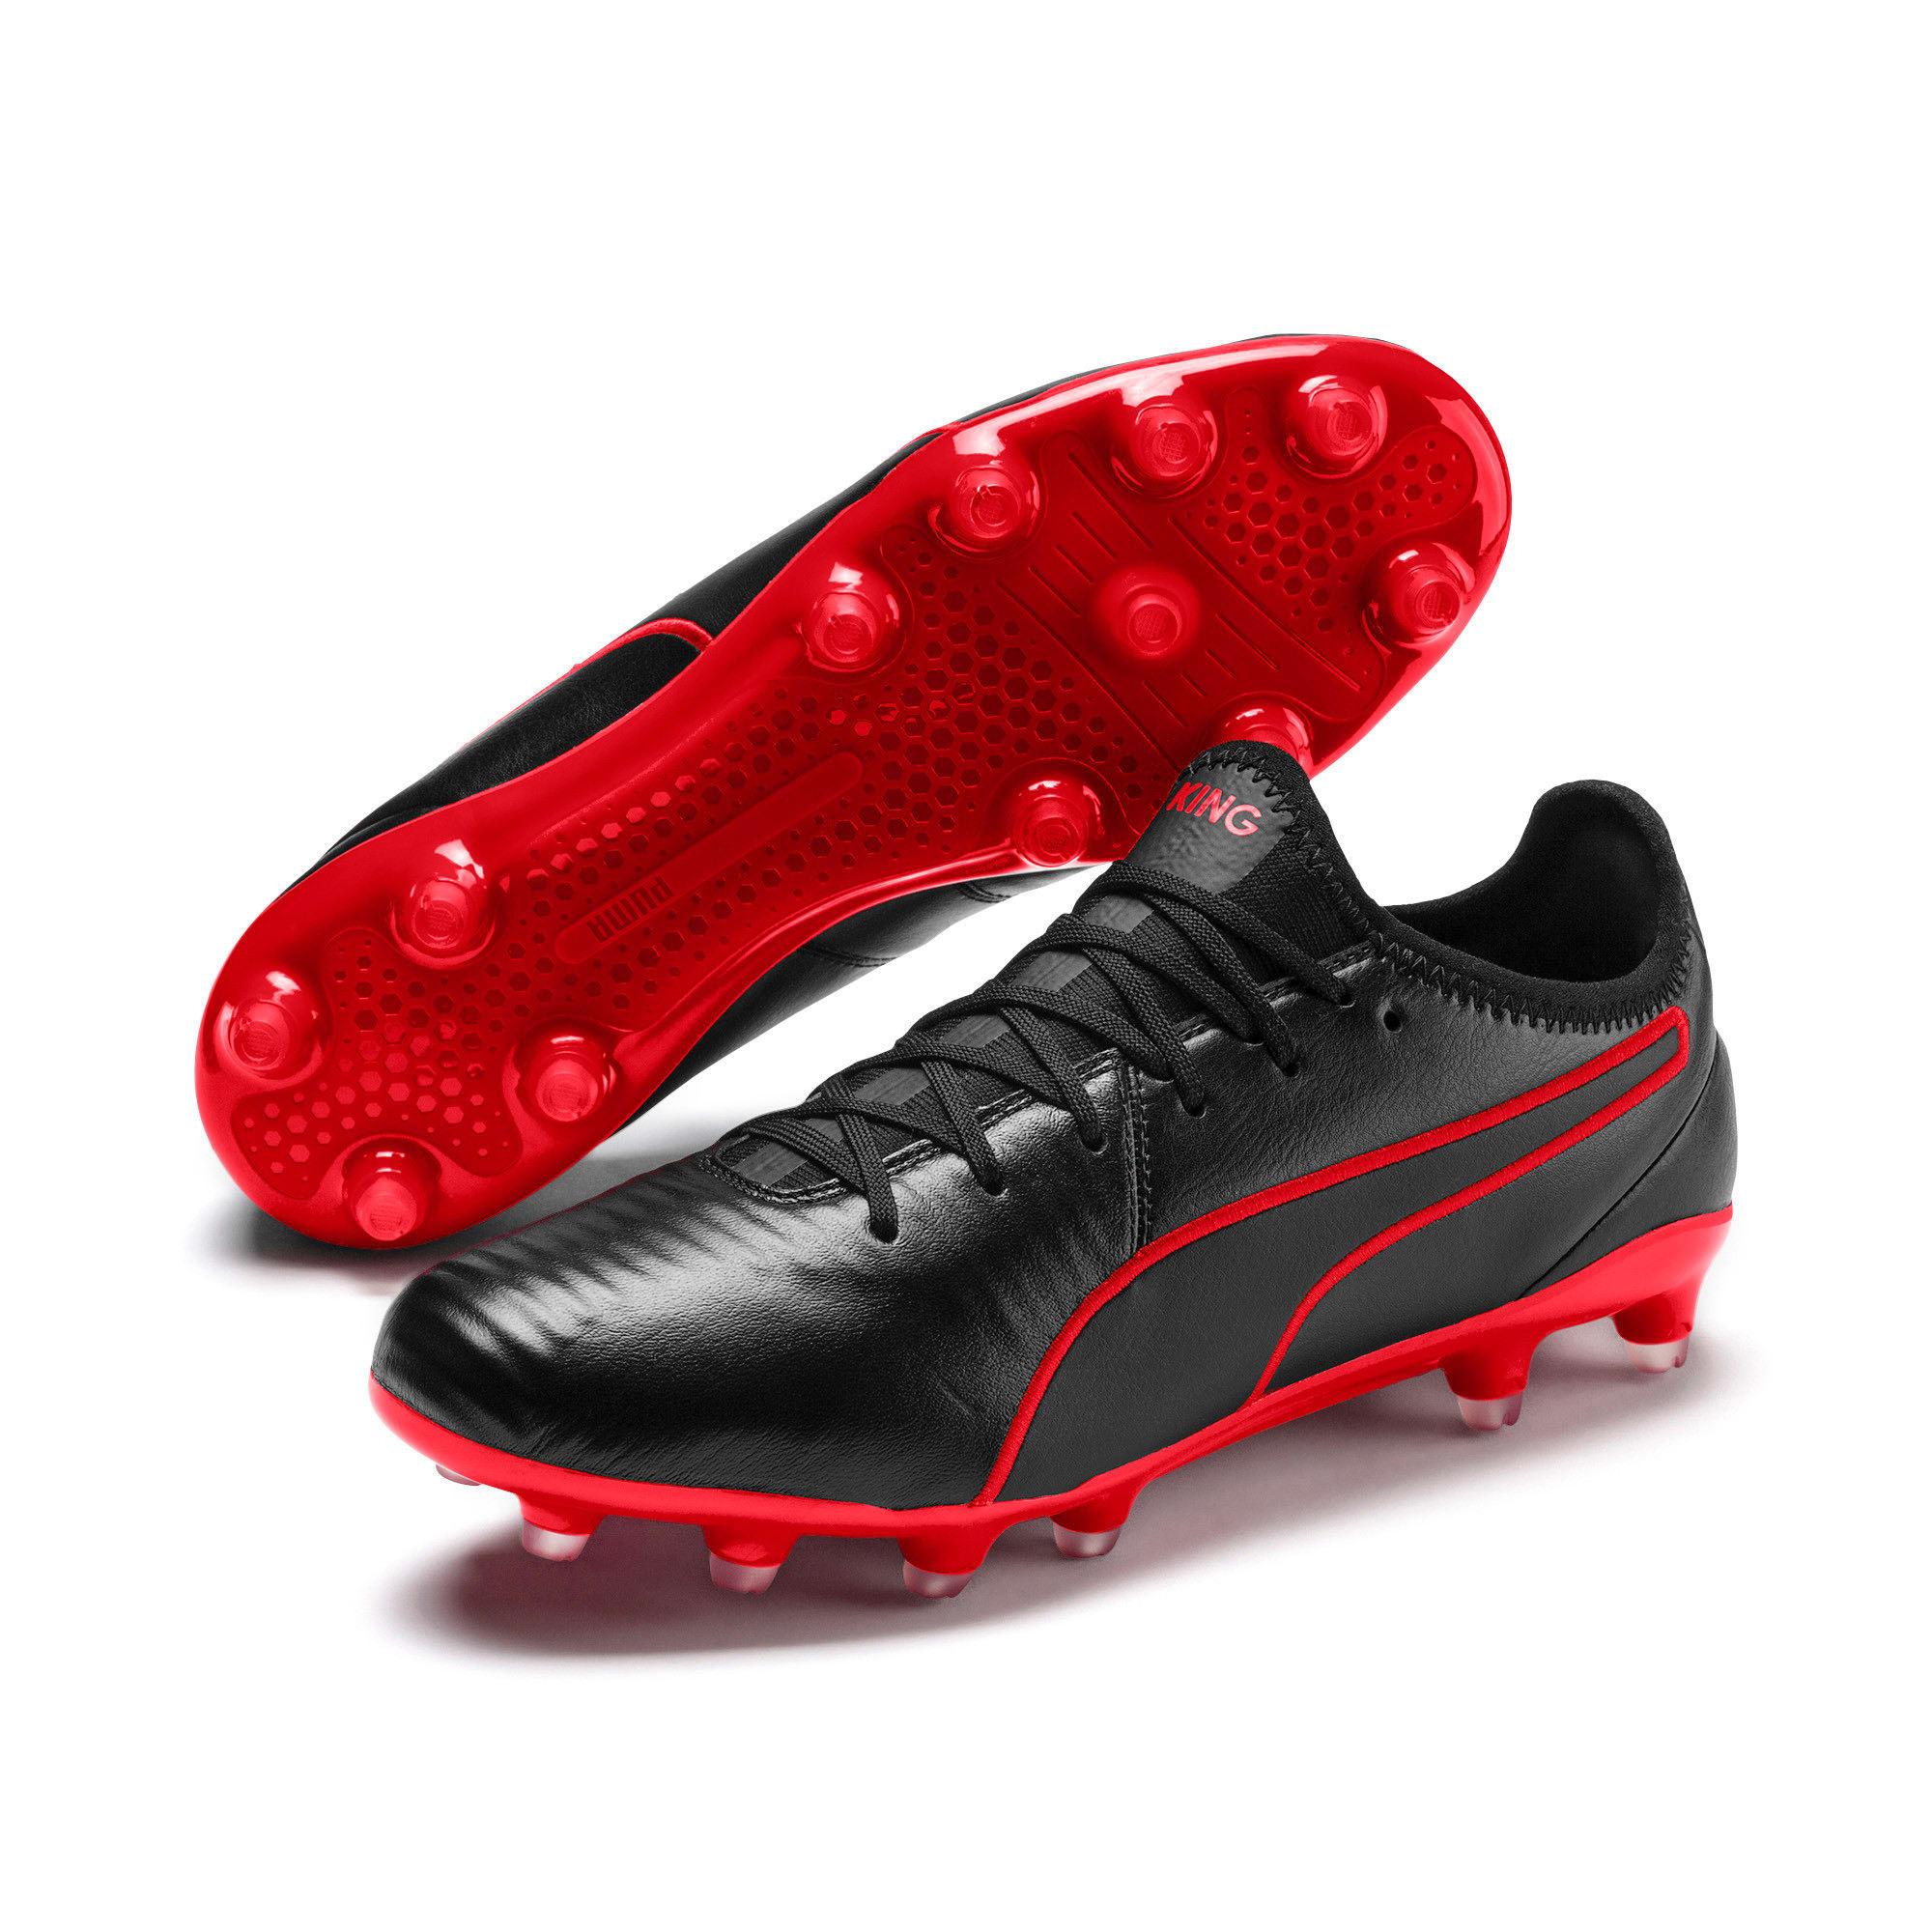 Thumbnail 2 of King Pro FG Soccer Cleats, Puma Black-High Risk Red, medium